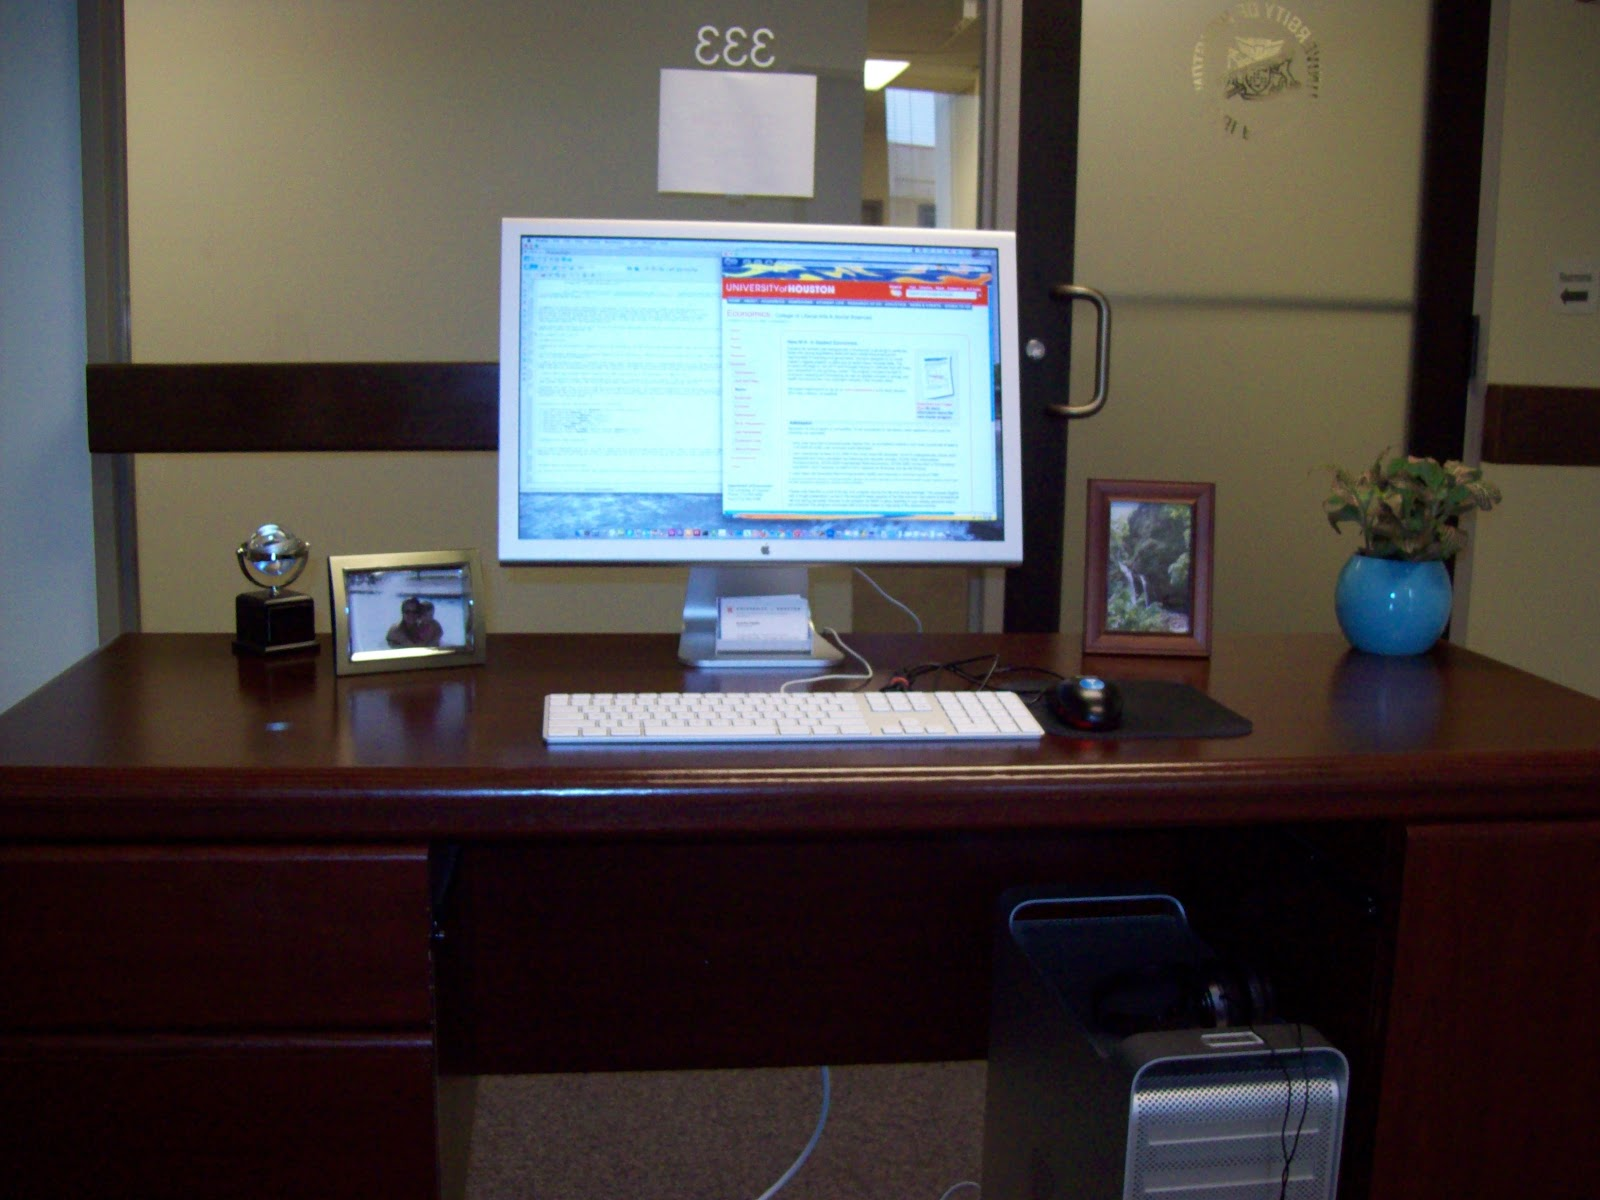 My Workspace - 000_0007.JPG